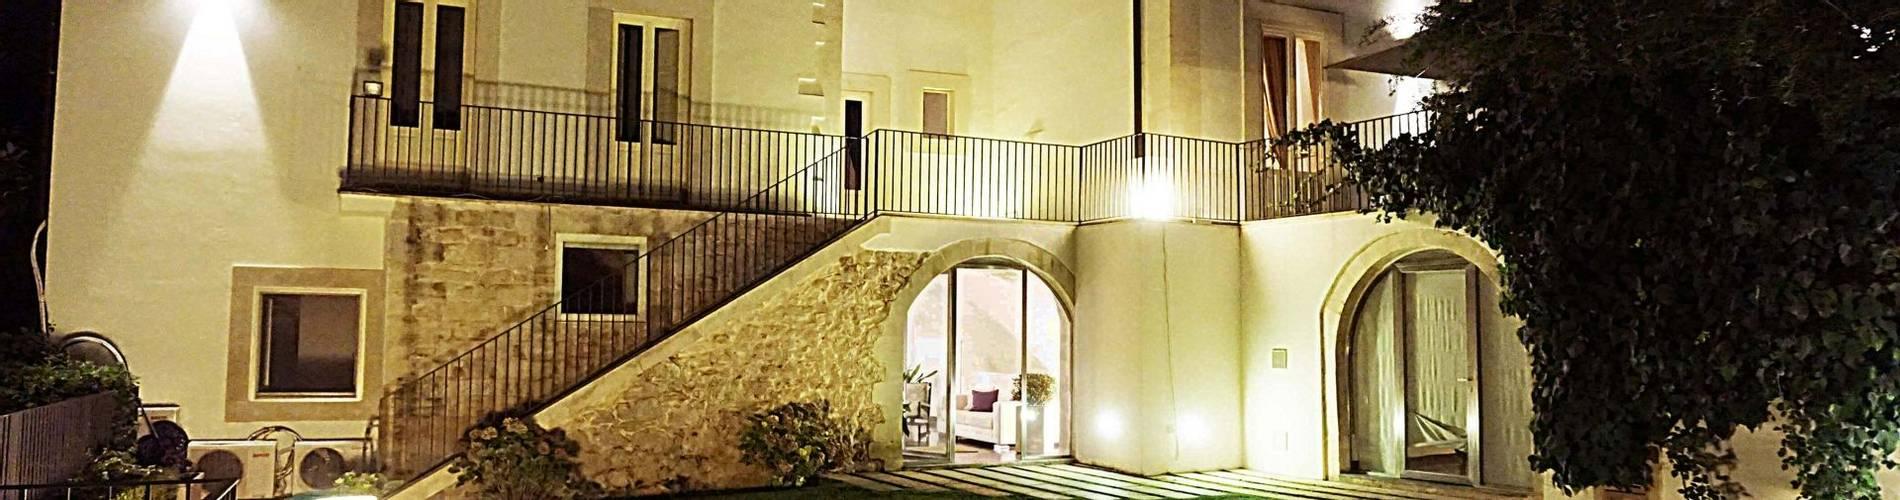 Villa Del Lauro, Sicily, Italy (3).jpg